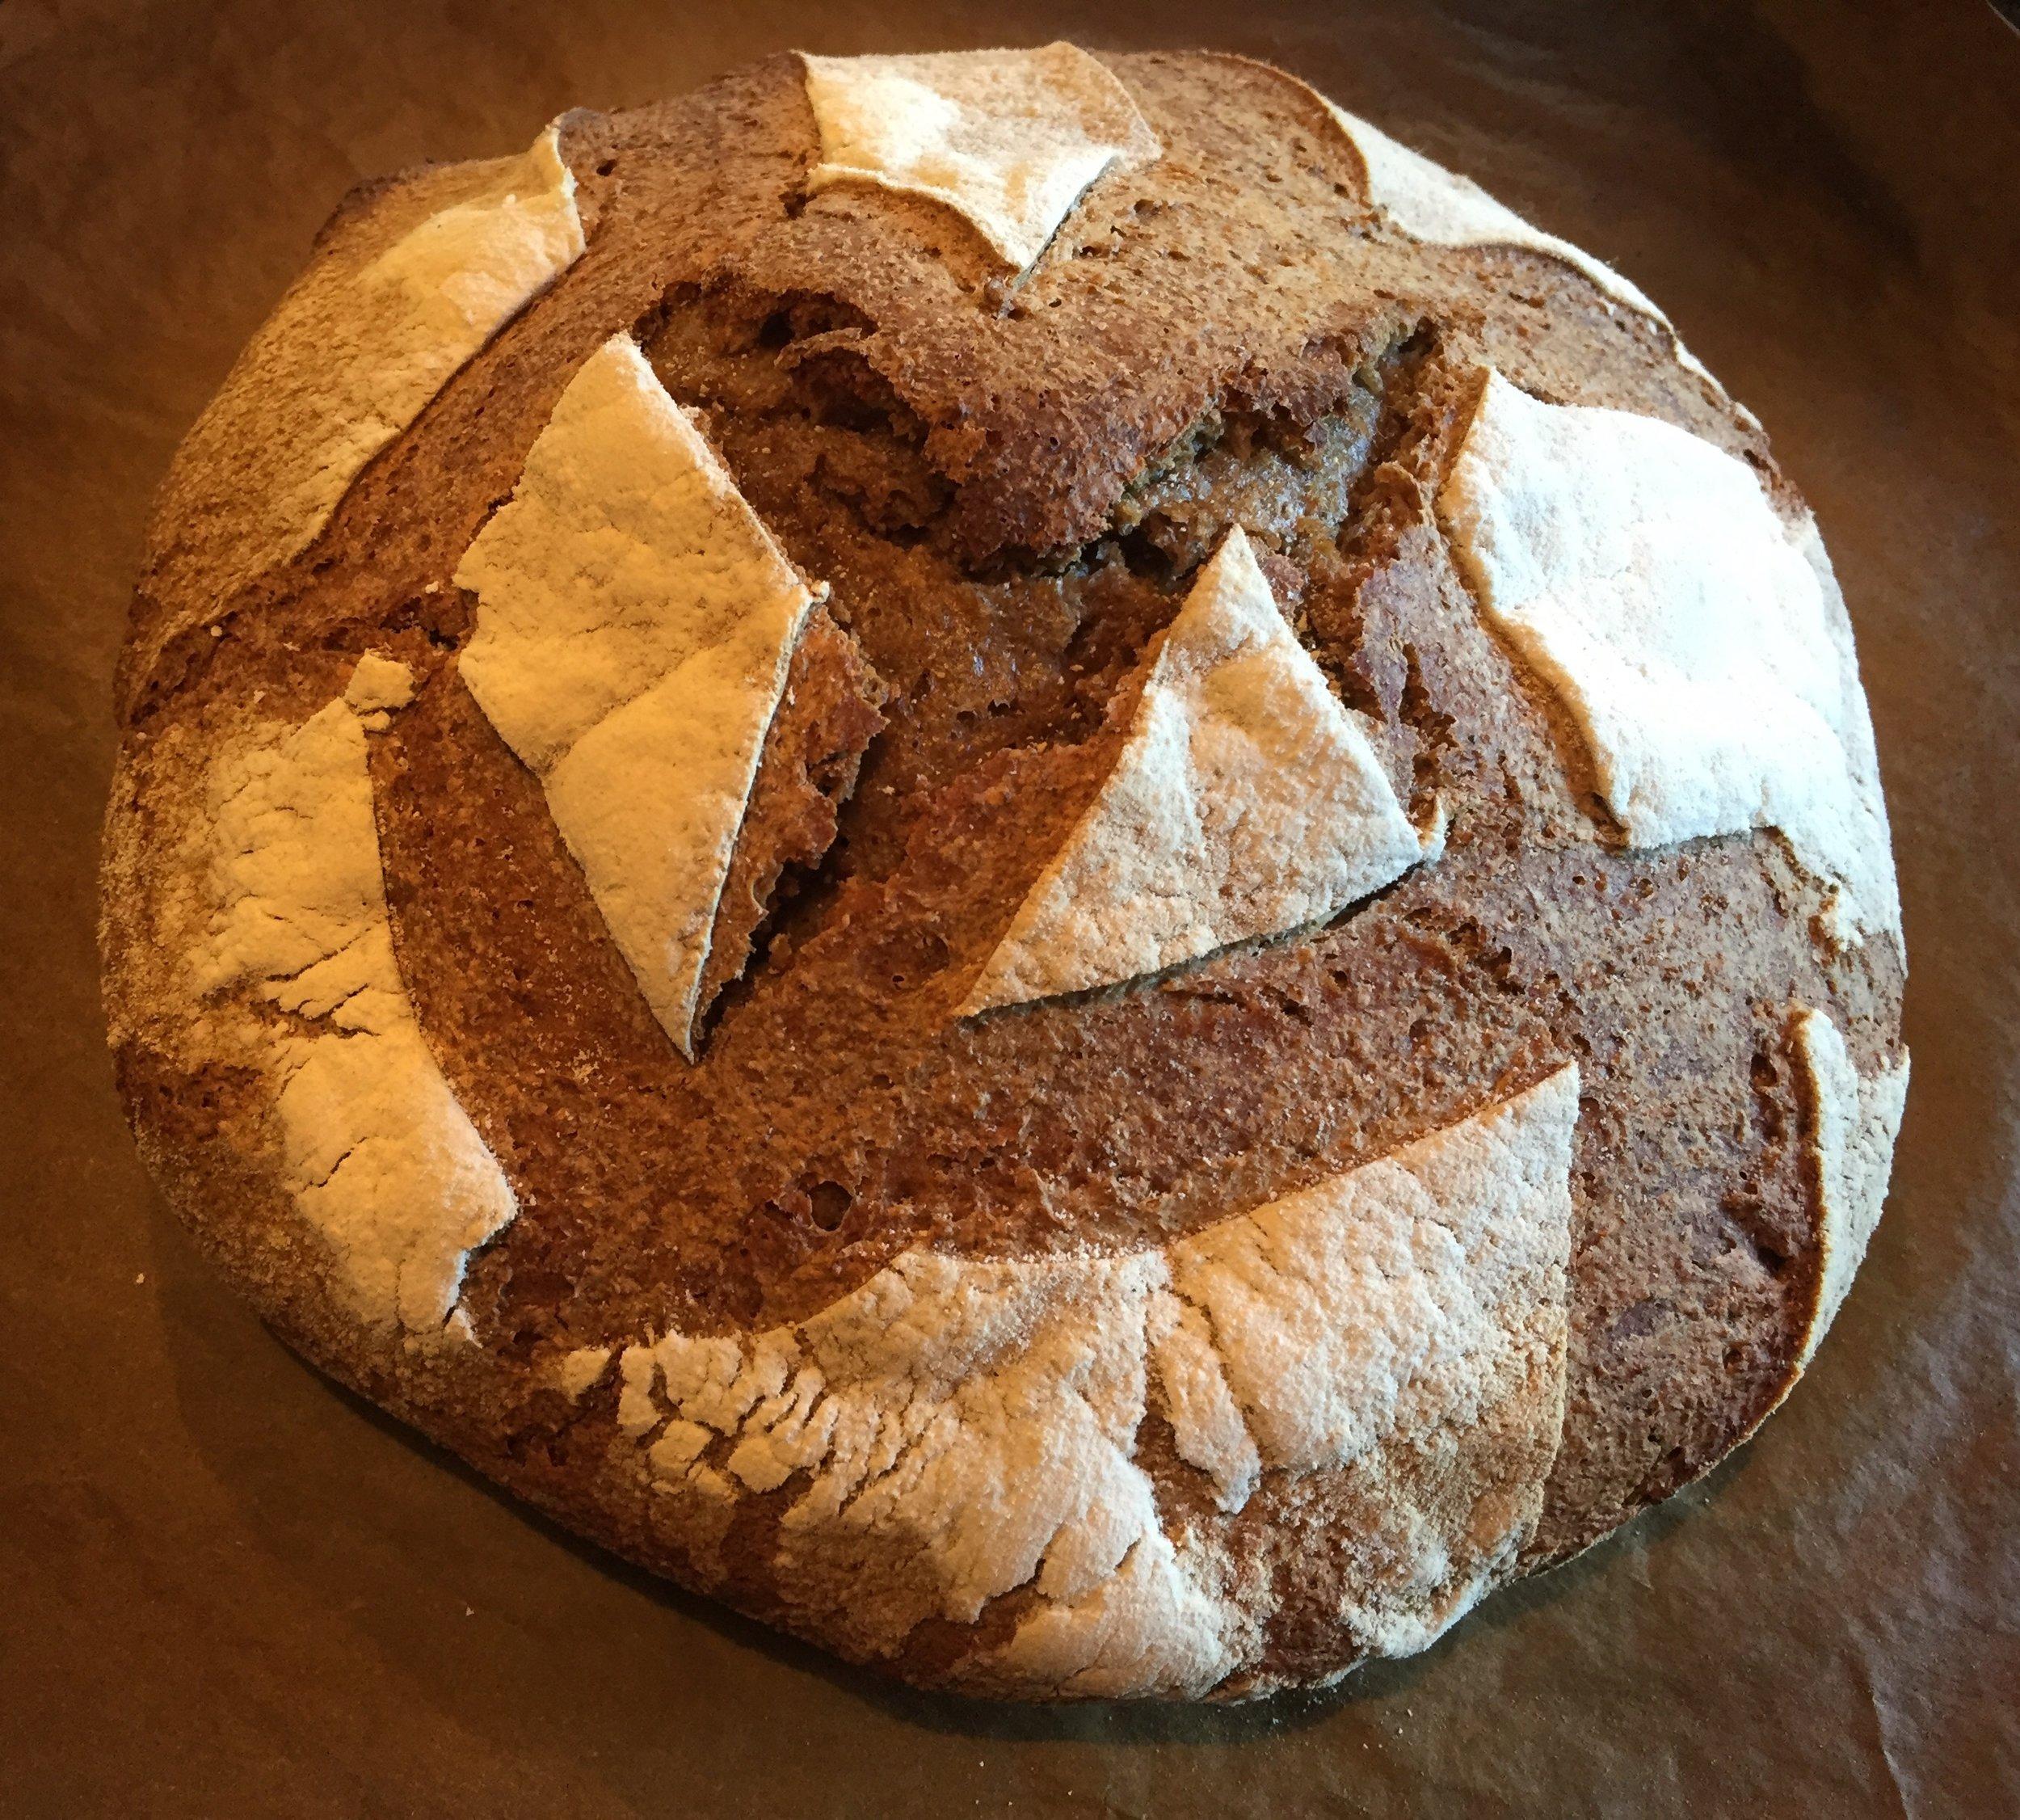 Sourdough bread.  It was delicious!